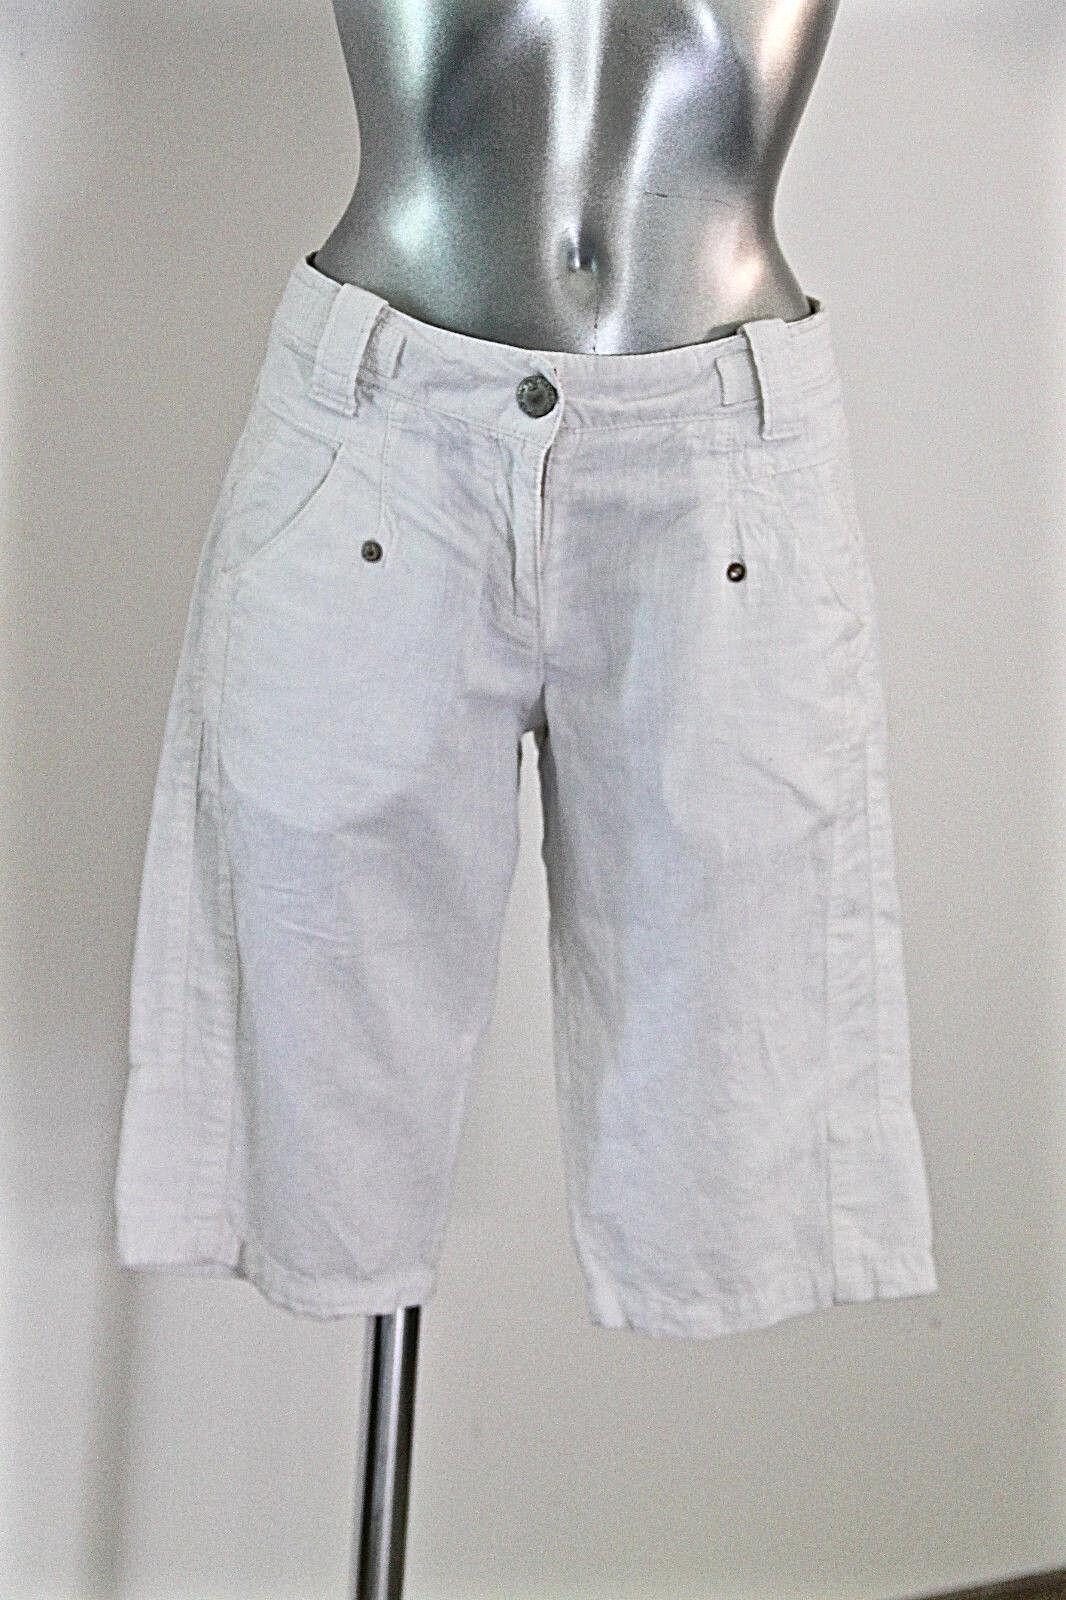 Pretty bermuda shorts safari trek cotton linen white woman NAPAPIJRI size 38 fr